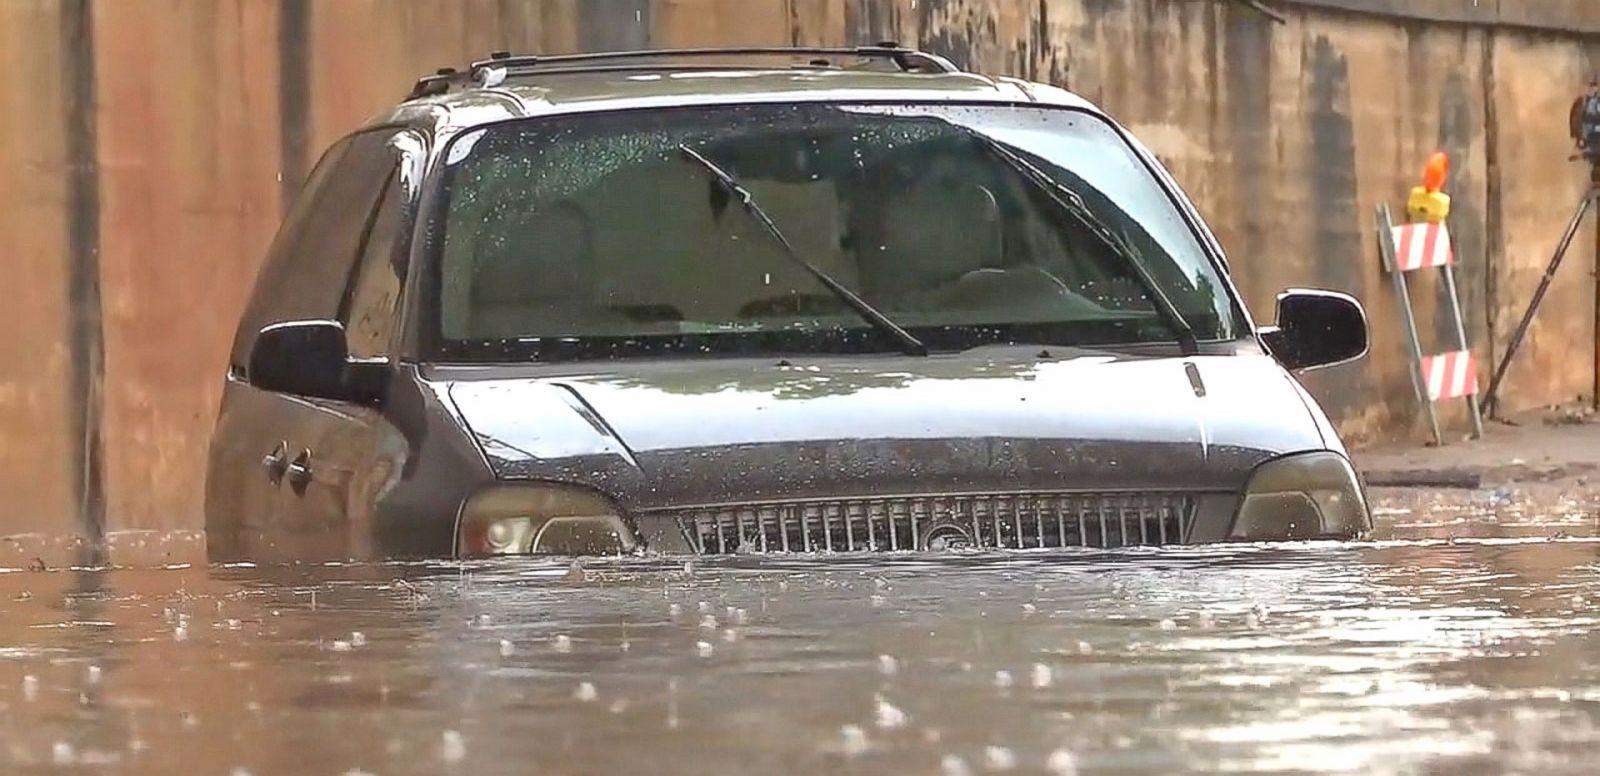 VIDEO: Record Rains Hit Hard in Texas Causing Flash Flooding